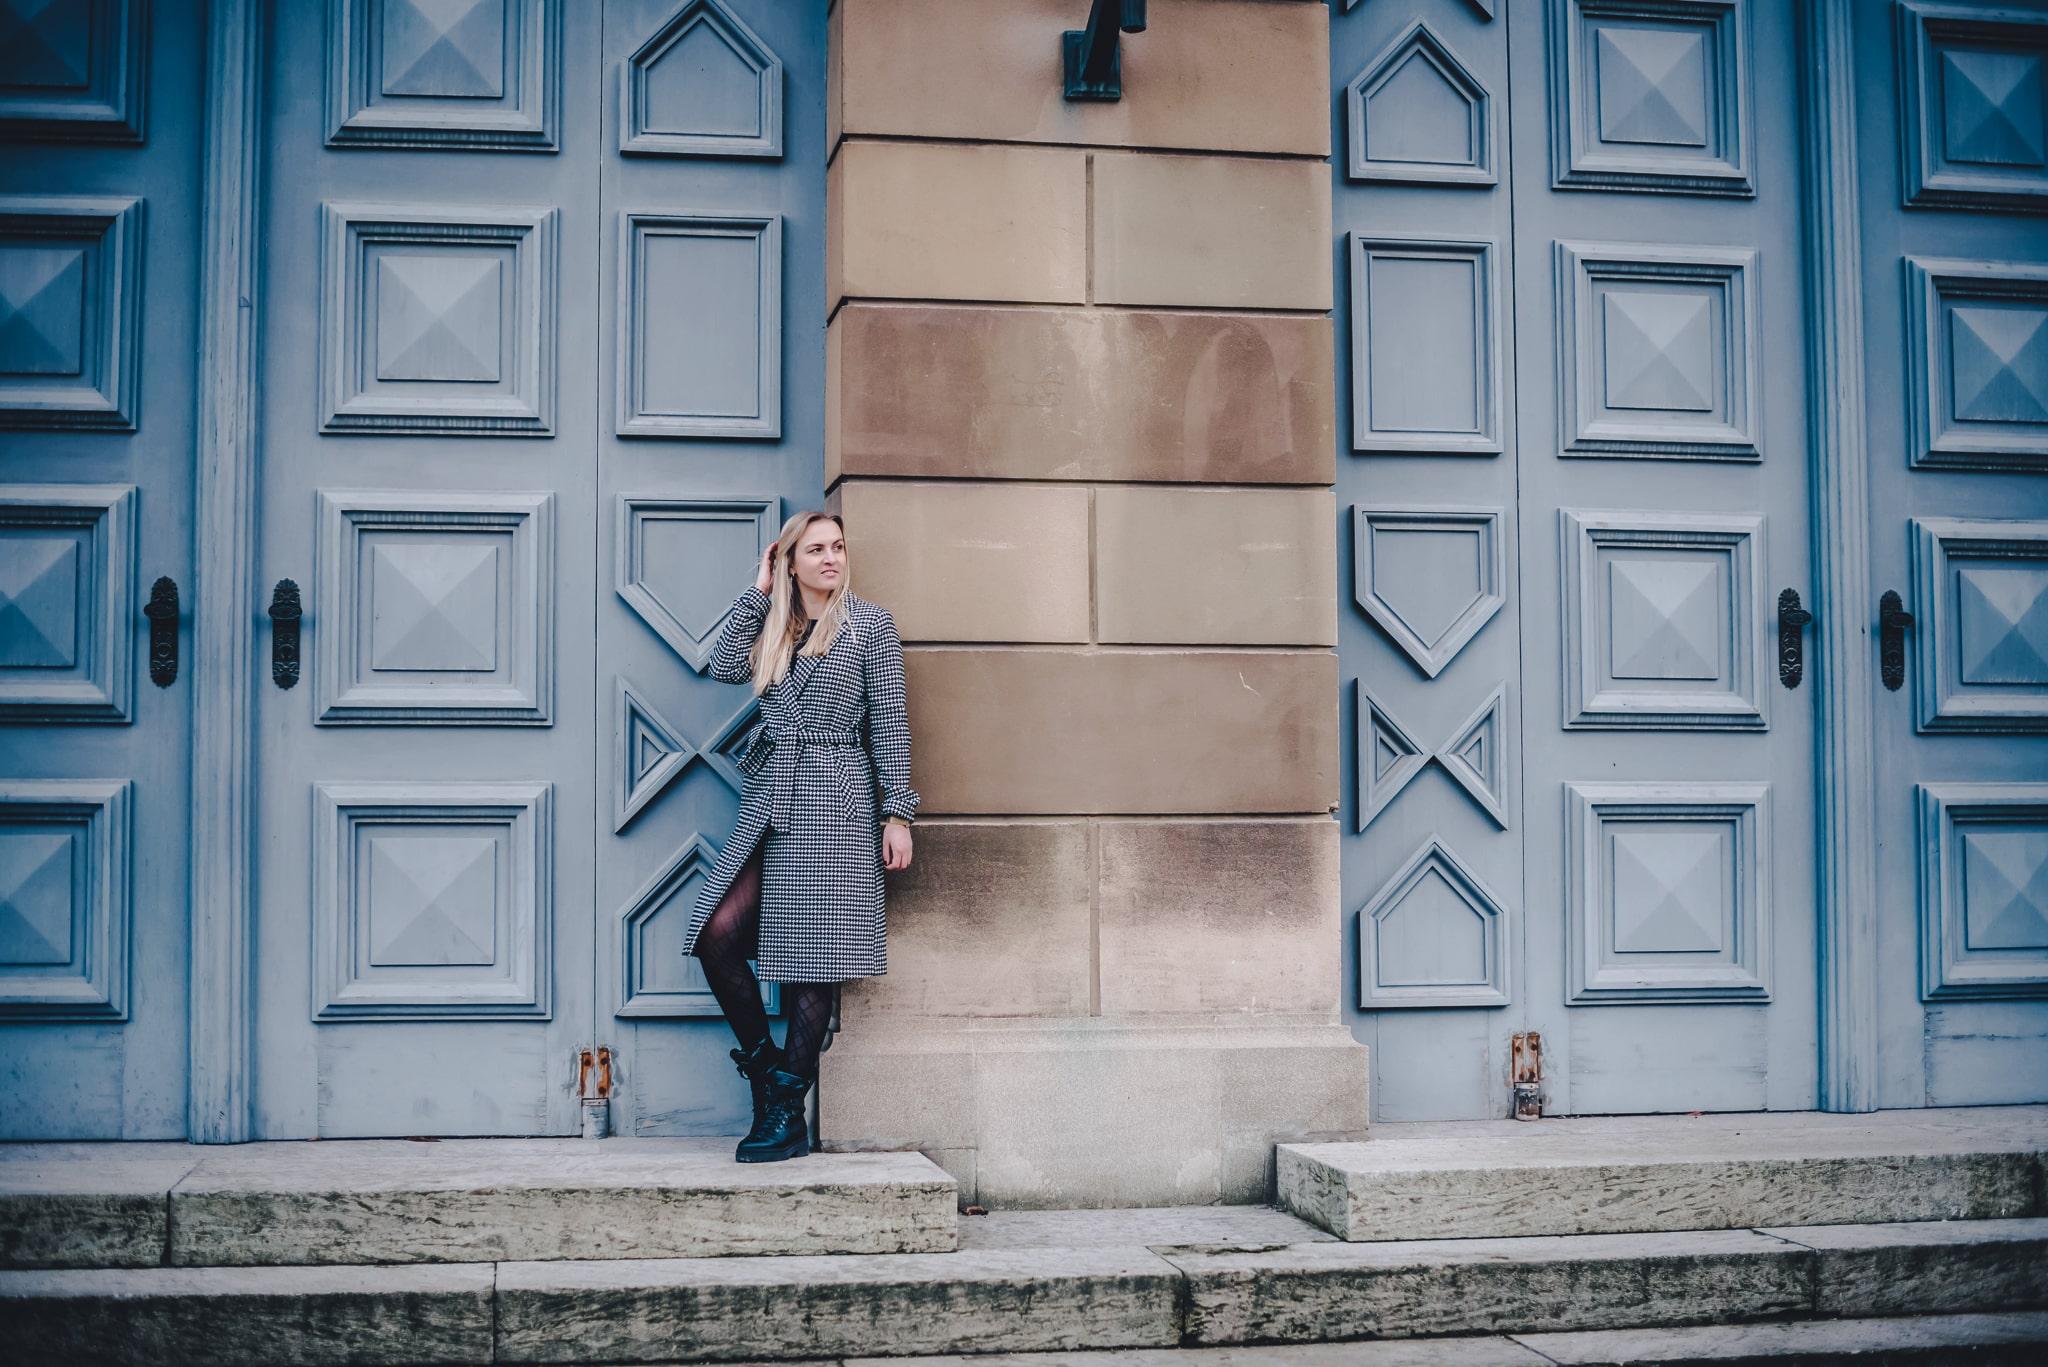 Kleiderschrank, Fashionblog, Modeblog, Kleidung, Trend 2020, Mantel, Karomuster, Jacke, München, Mode, Strumpfhose Muster